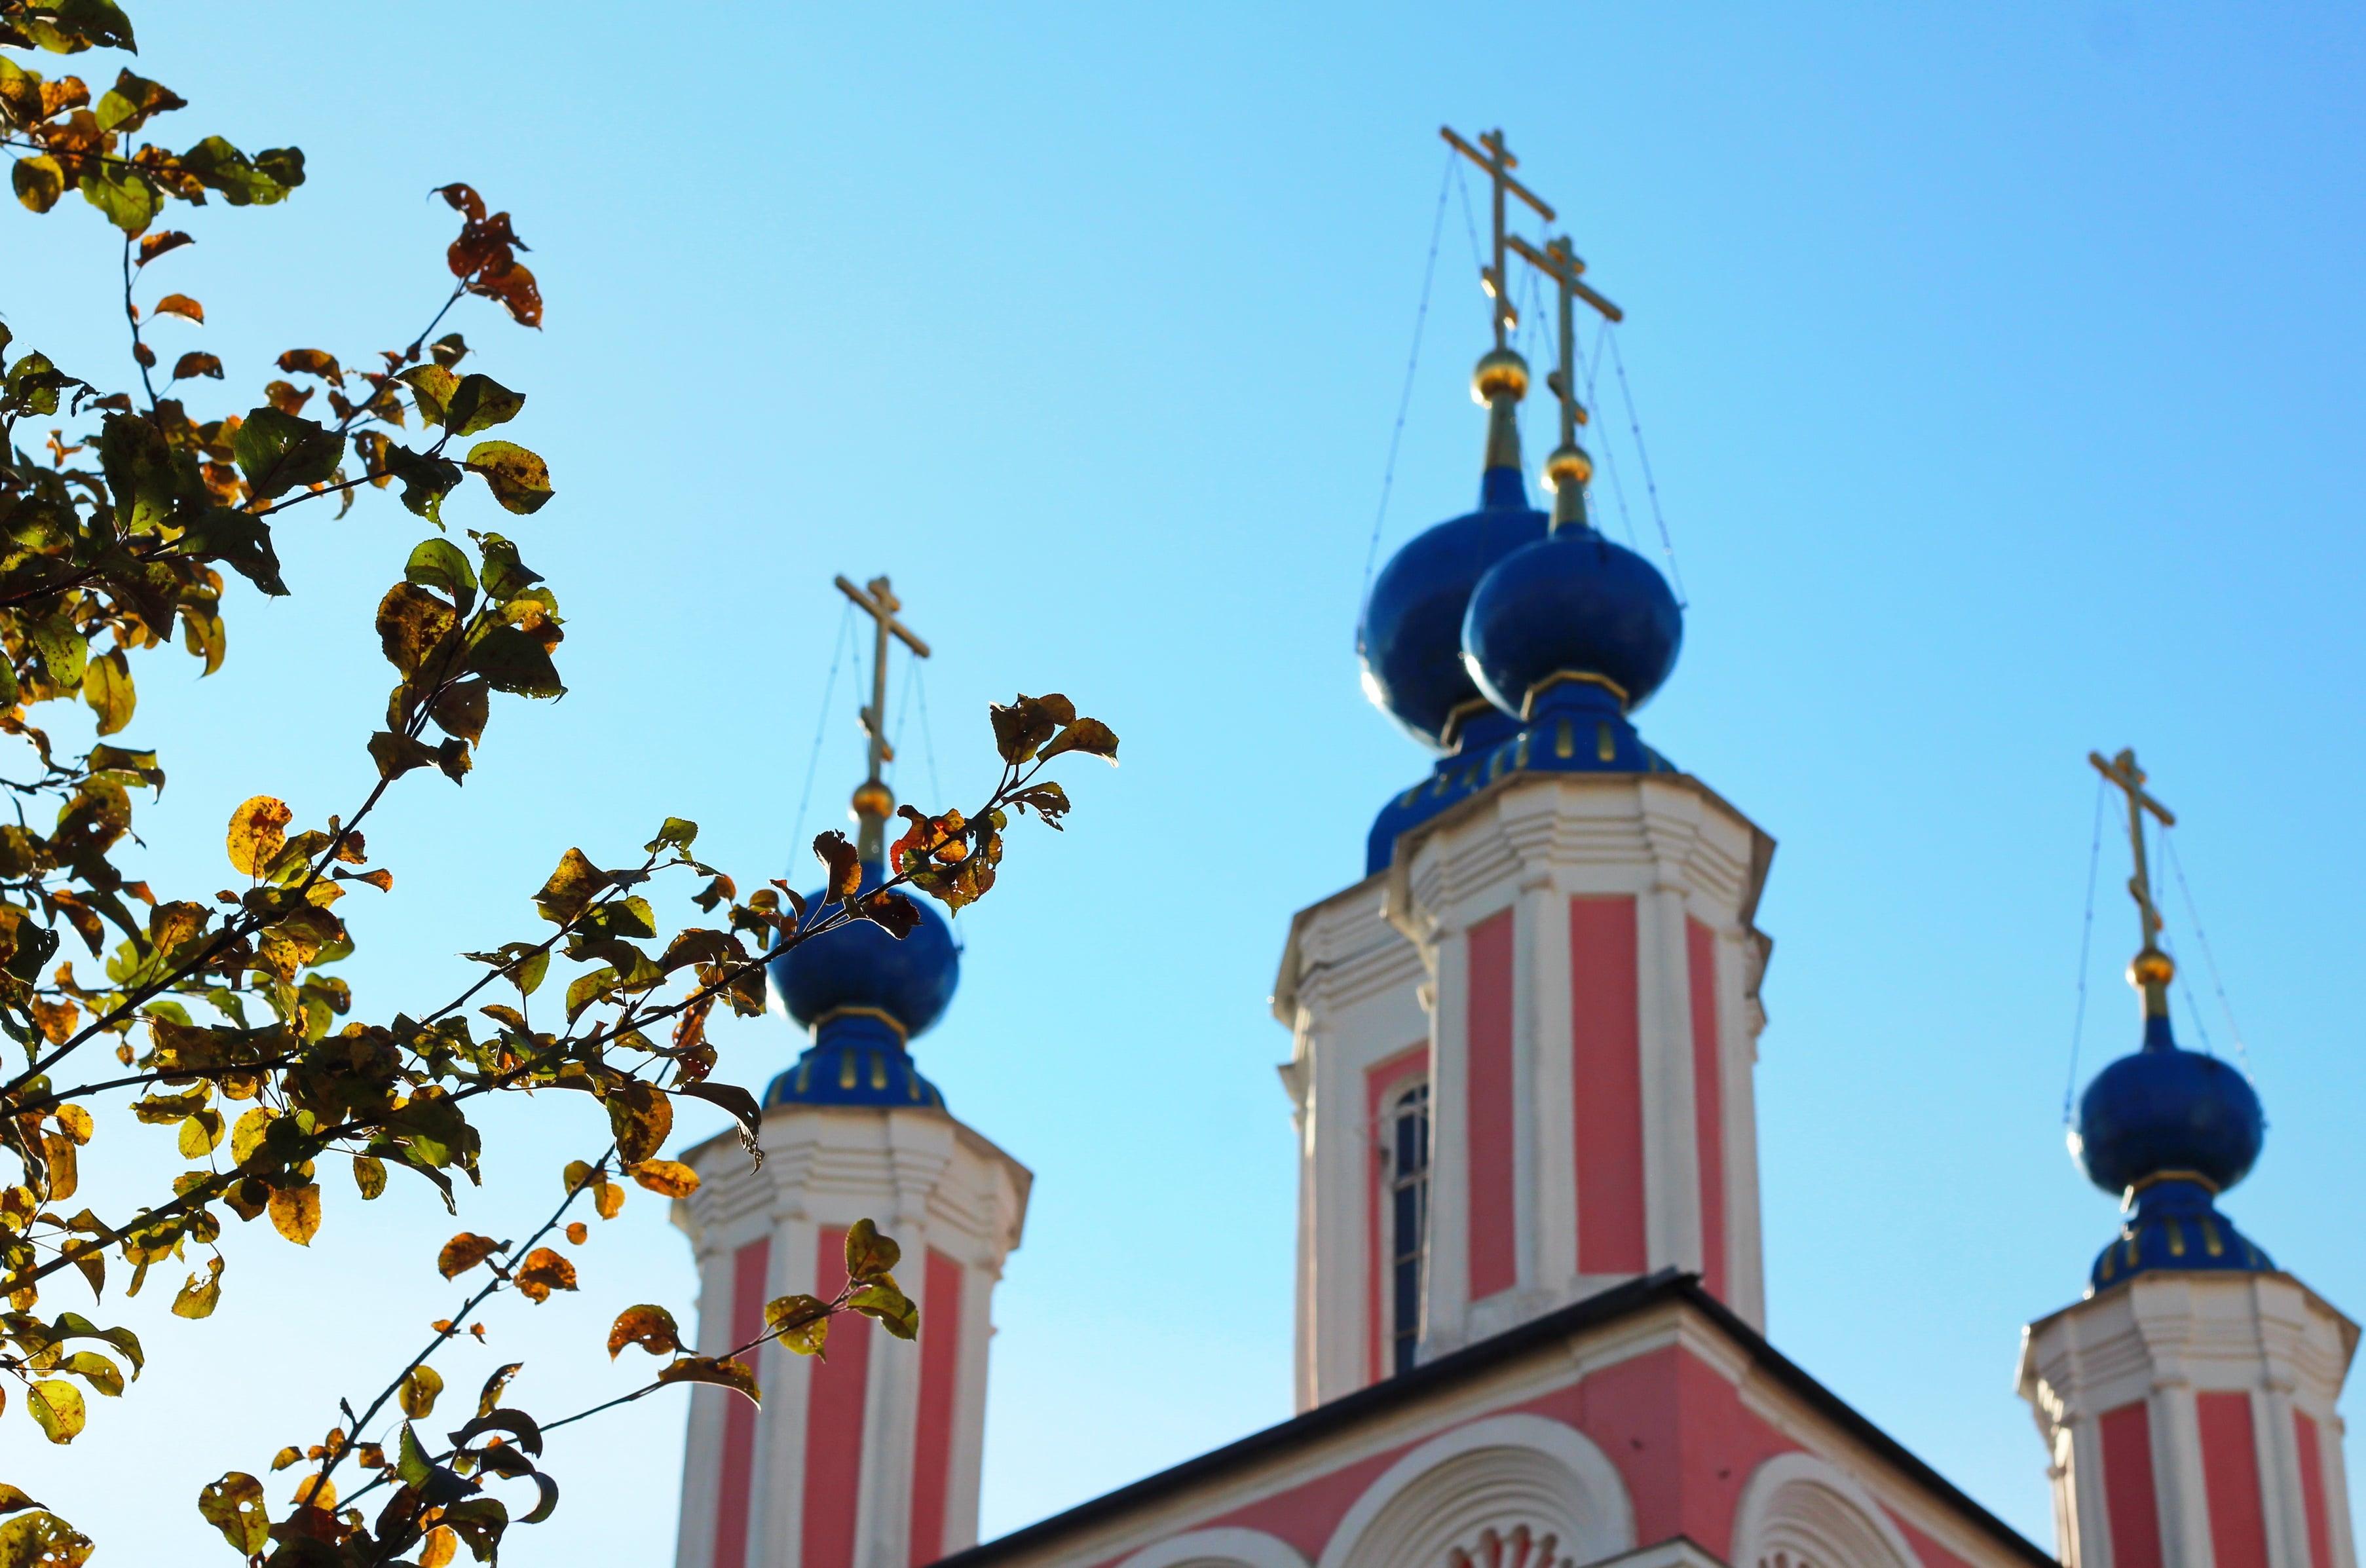 http://monuspen.ru/photoreports/7df66090564ac3621568a9866ab706am.JPG